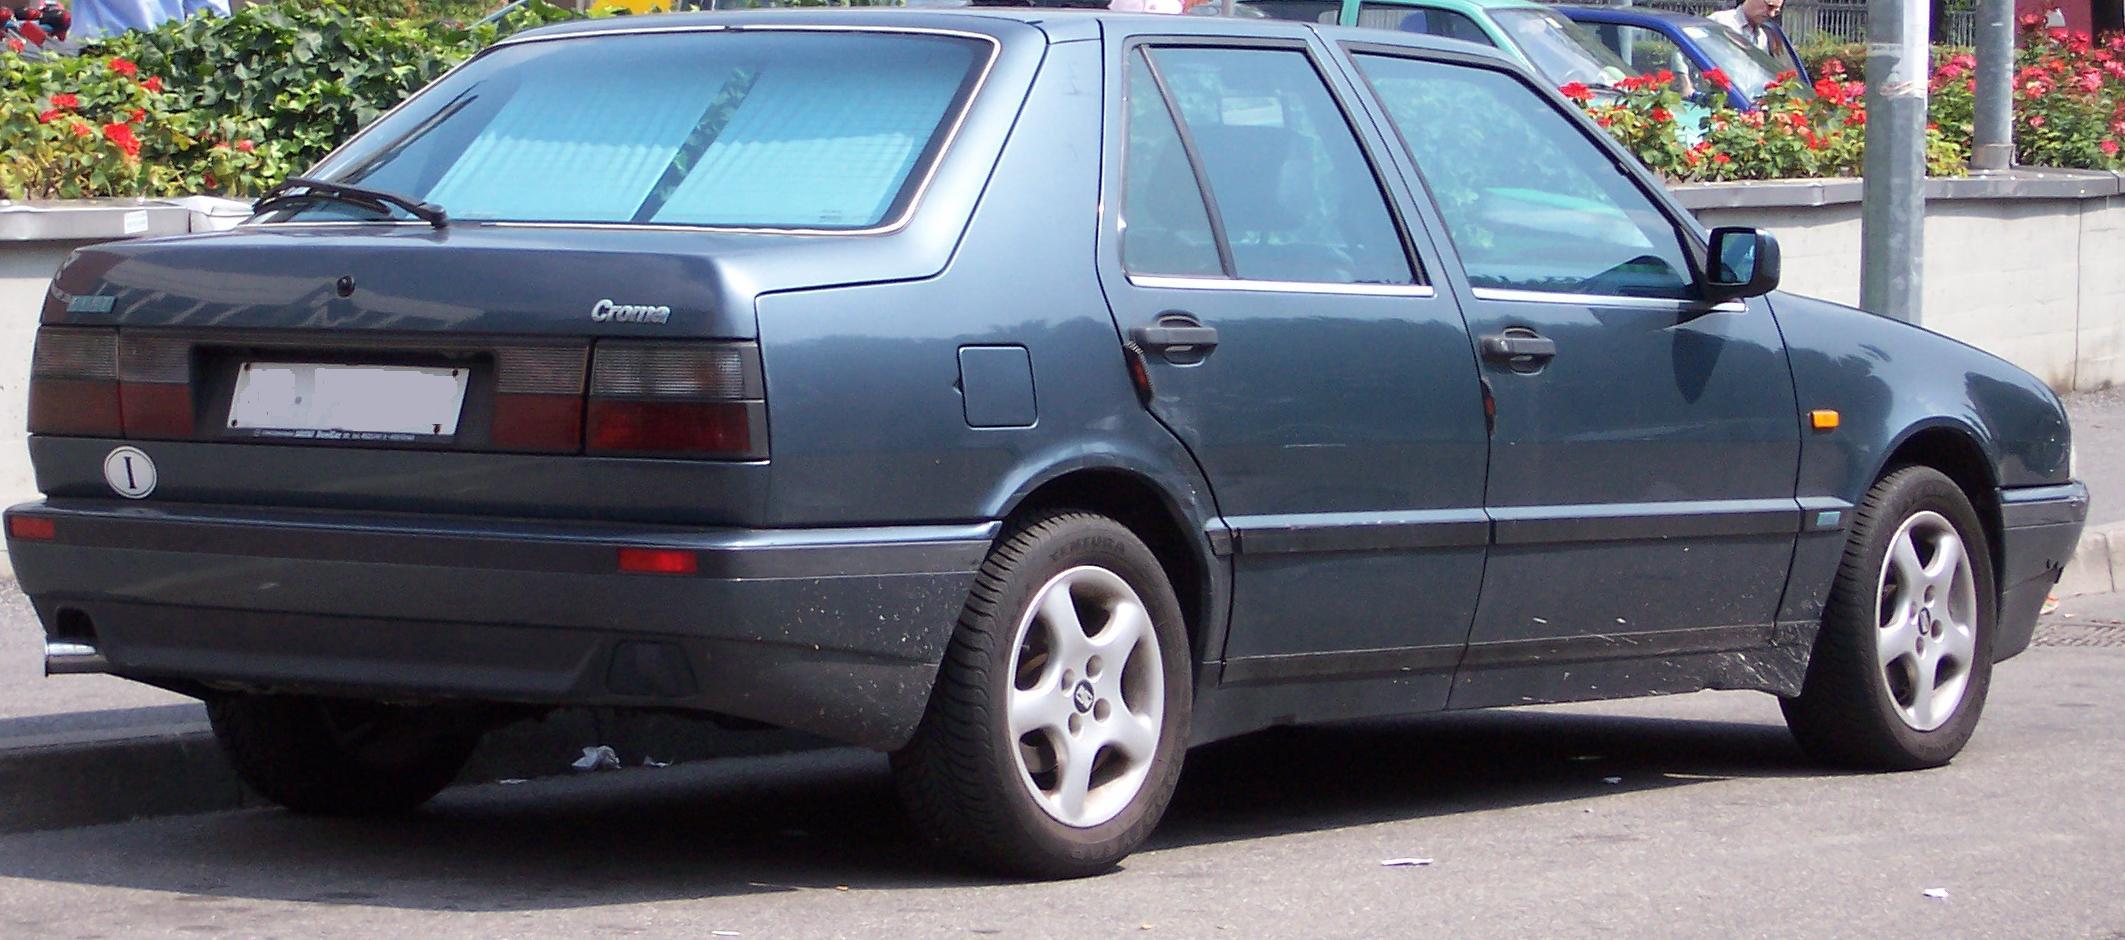 FIAT CROMA 2.5 TD